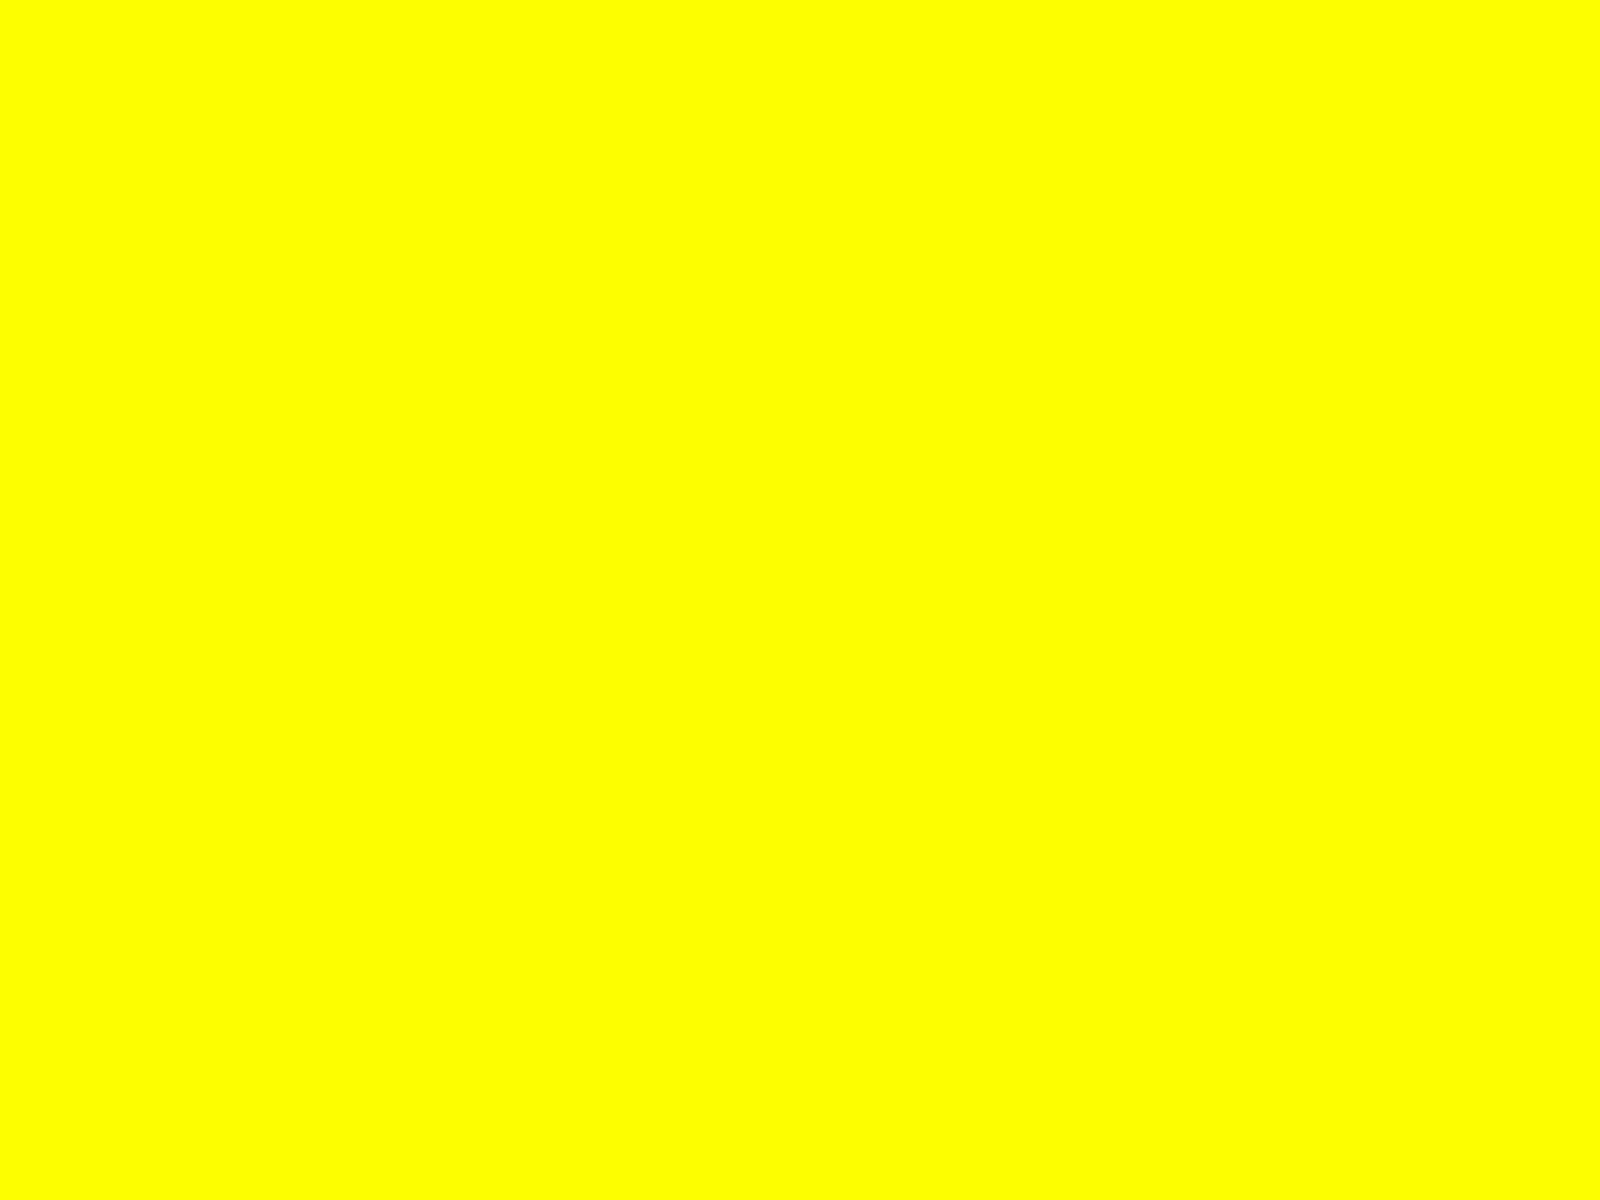 1600x1200 Lemon Glacier Solid Color Background